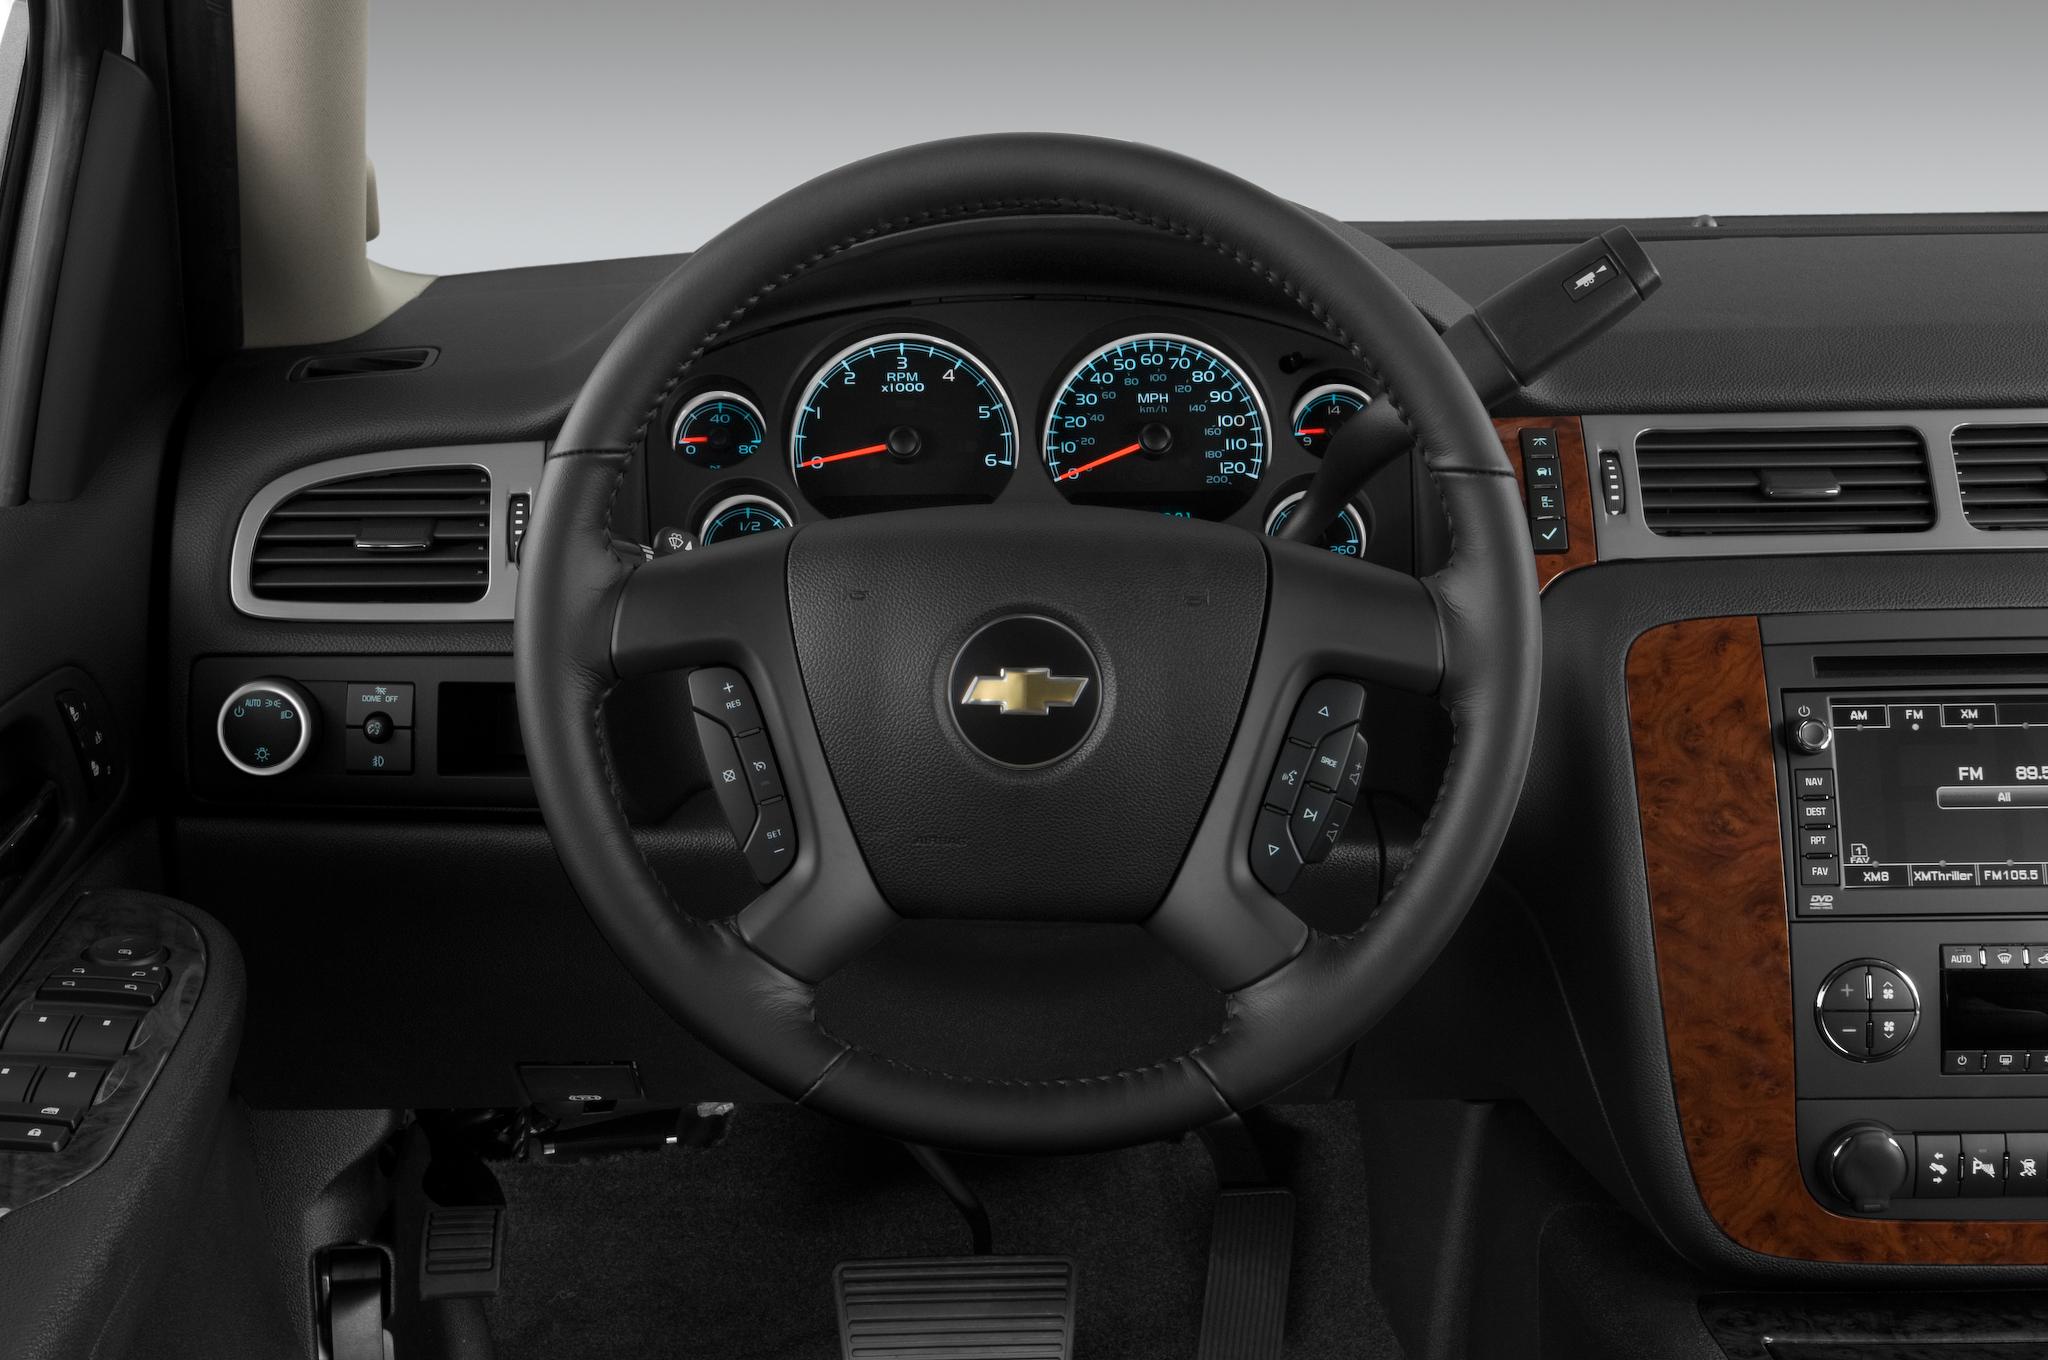 2015 GMC Yukon, Chevrolet Tahoe Spotted Testing